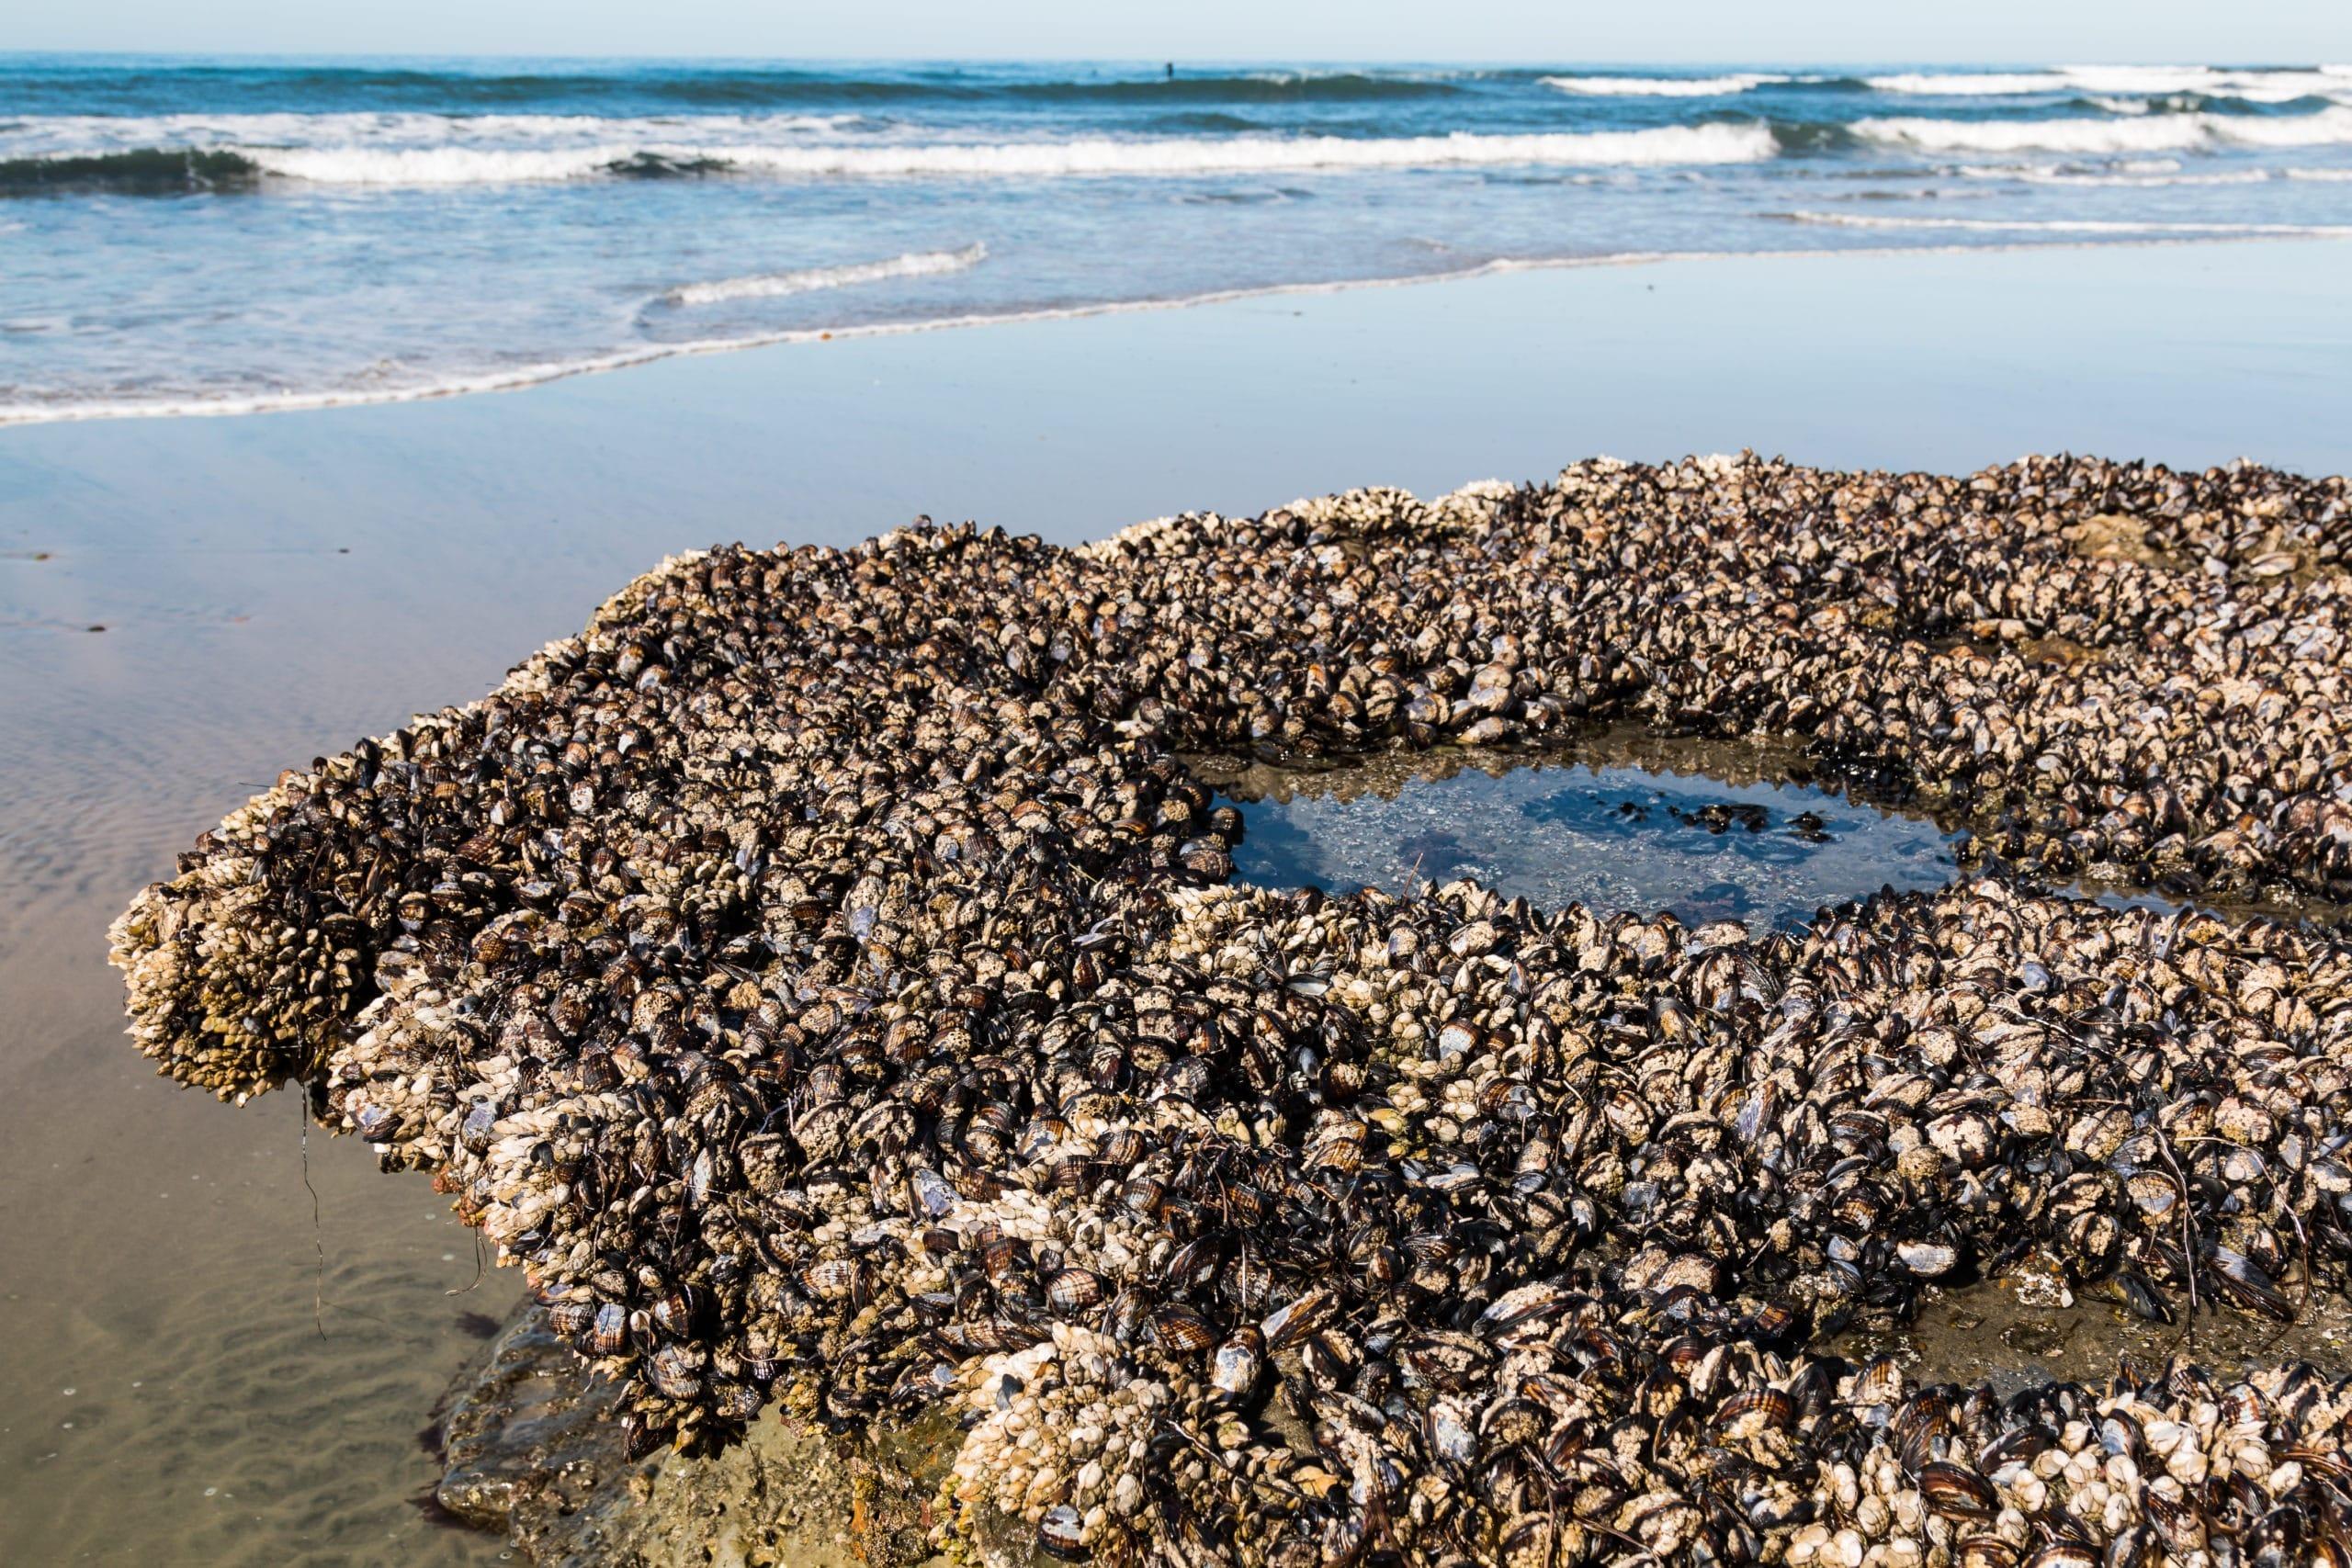 Lots of mollusks create their own tide pool at Swami's State Beach in Encinitas, California.